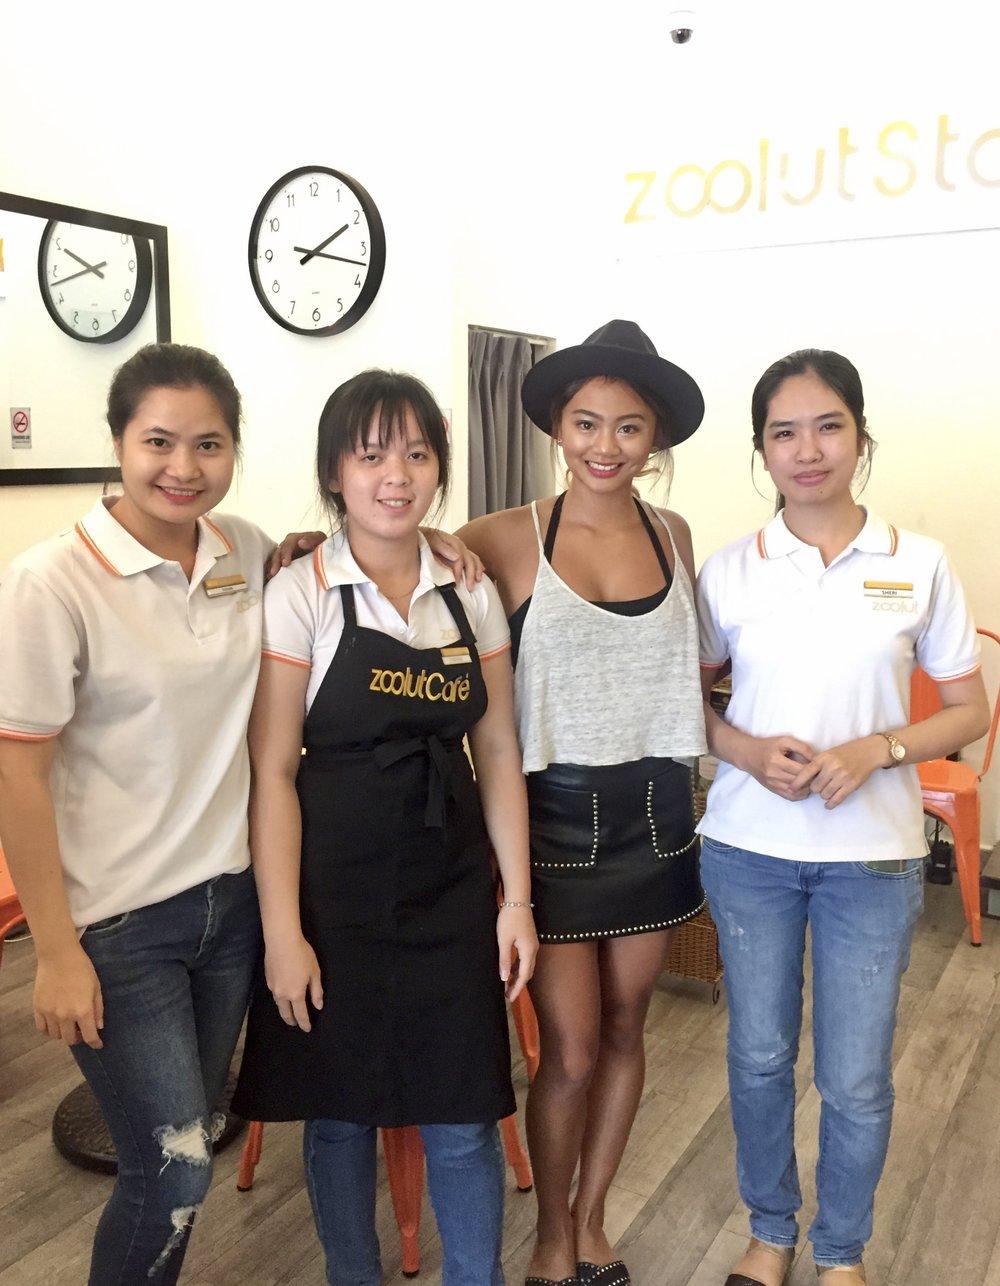 Mahhh ladies @ Zoolut Stay 271, Ho Chi Minh, Vietnam.